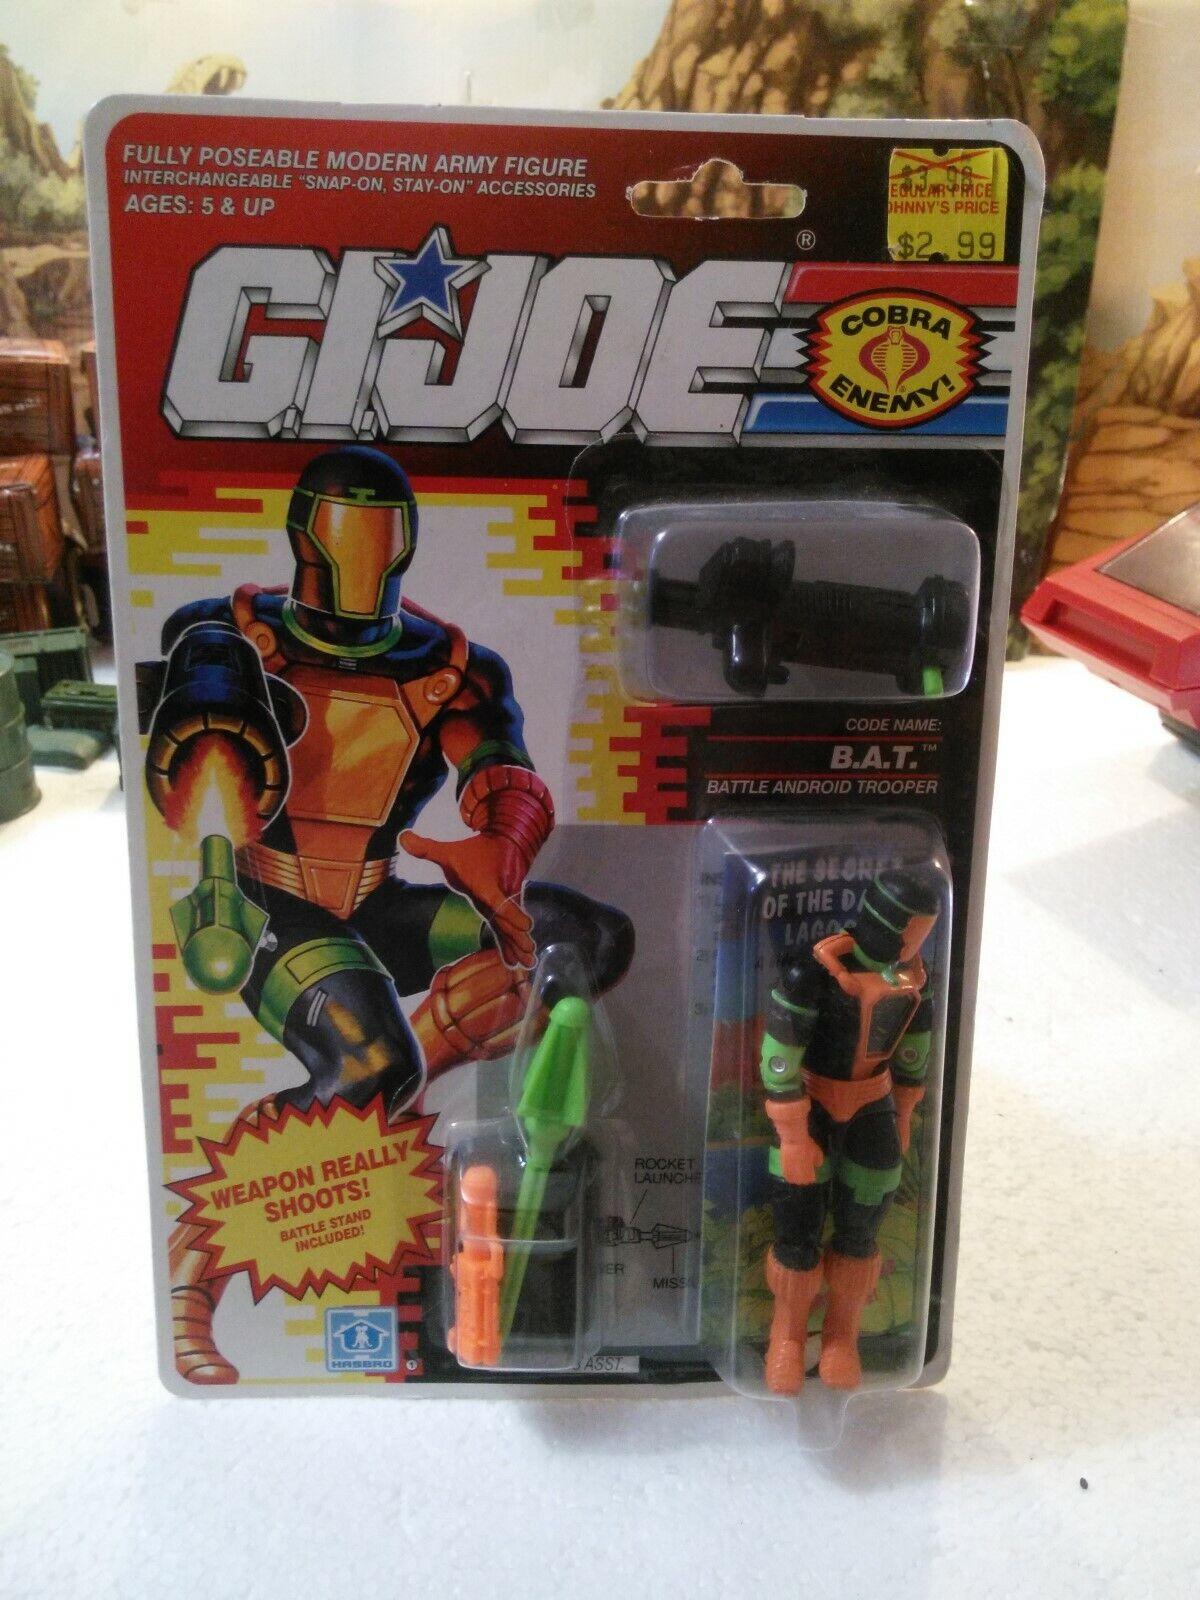 1991 battaglia eroid Trooper  COBRA B.A.T.v2 100% CMPMOC